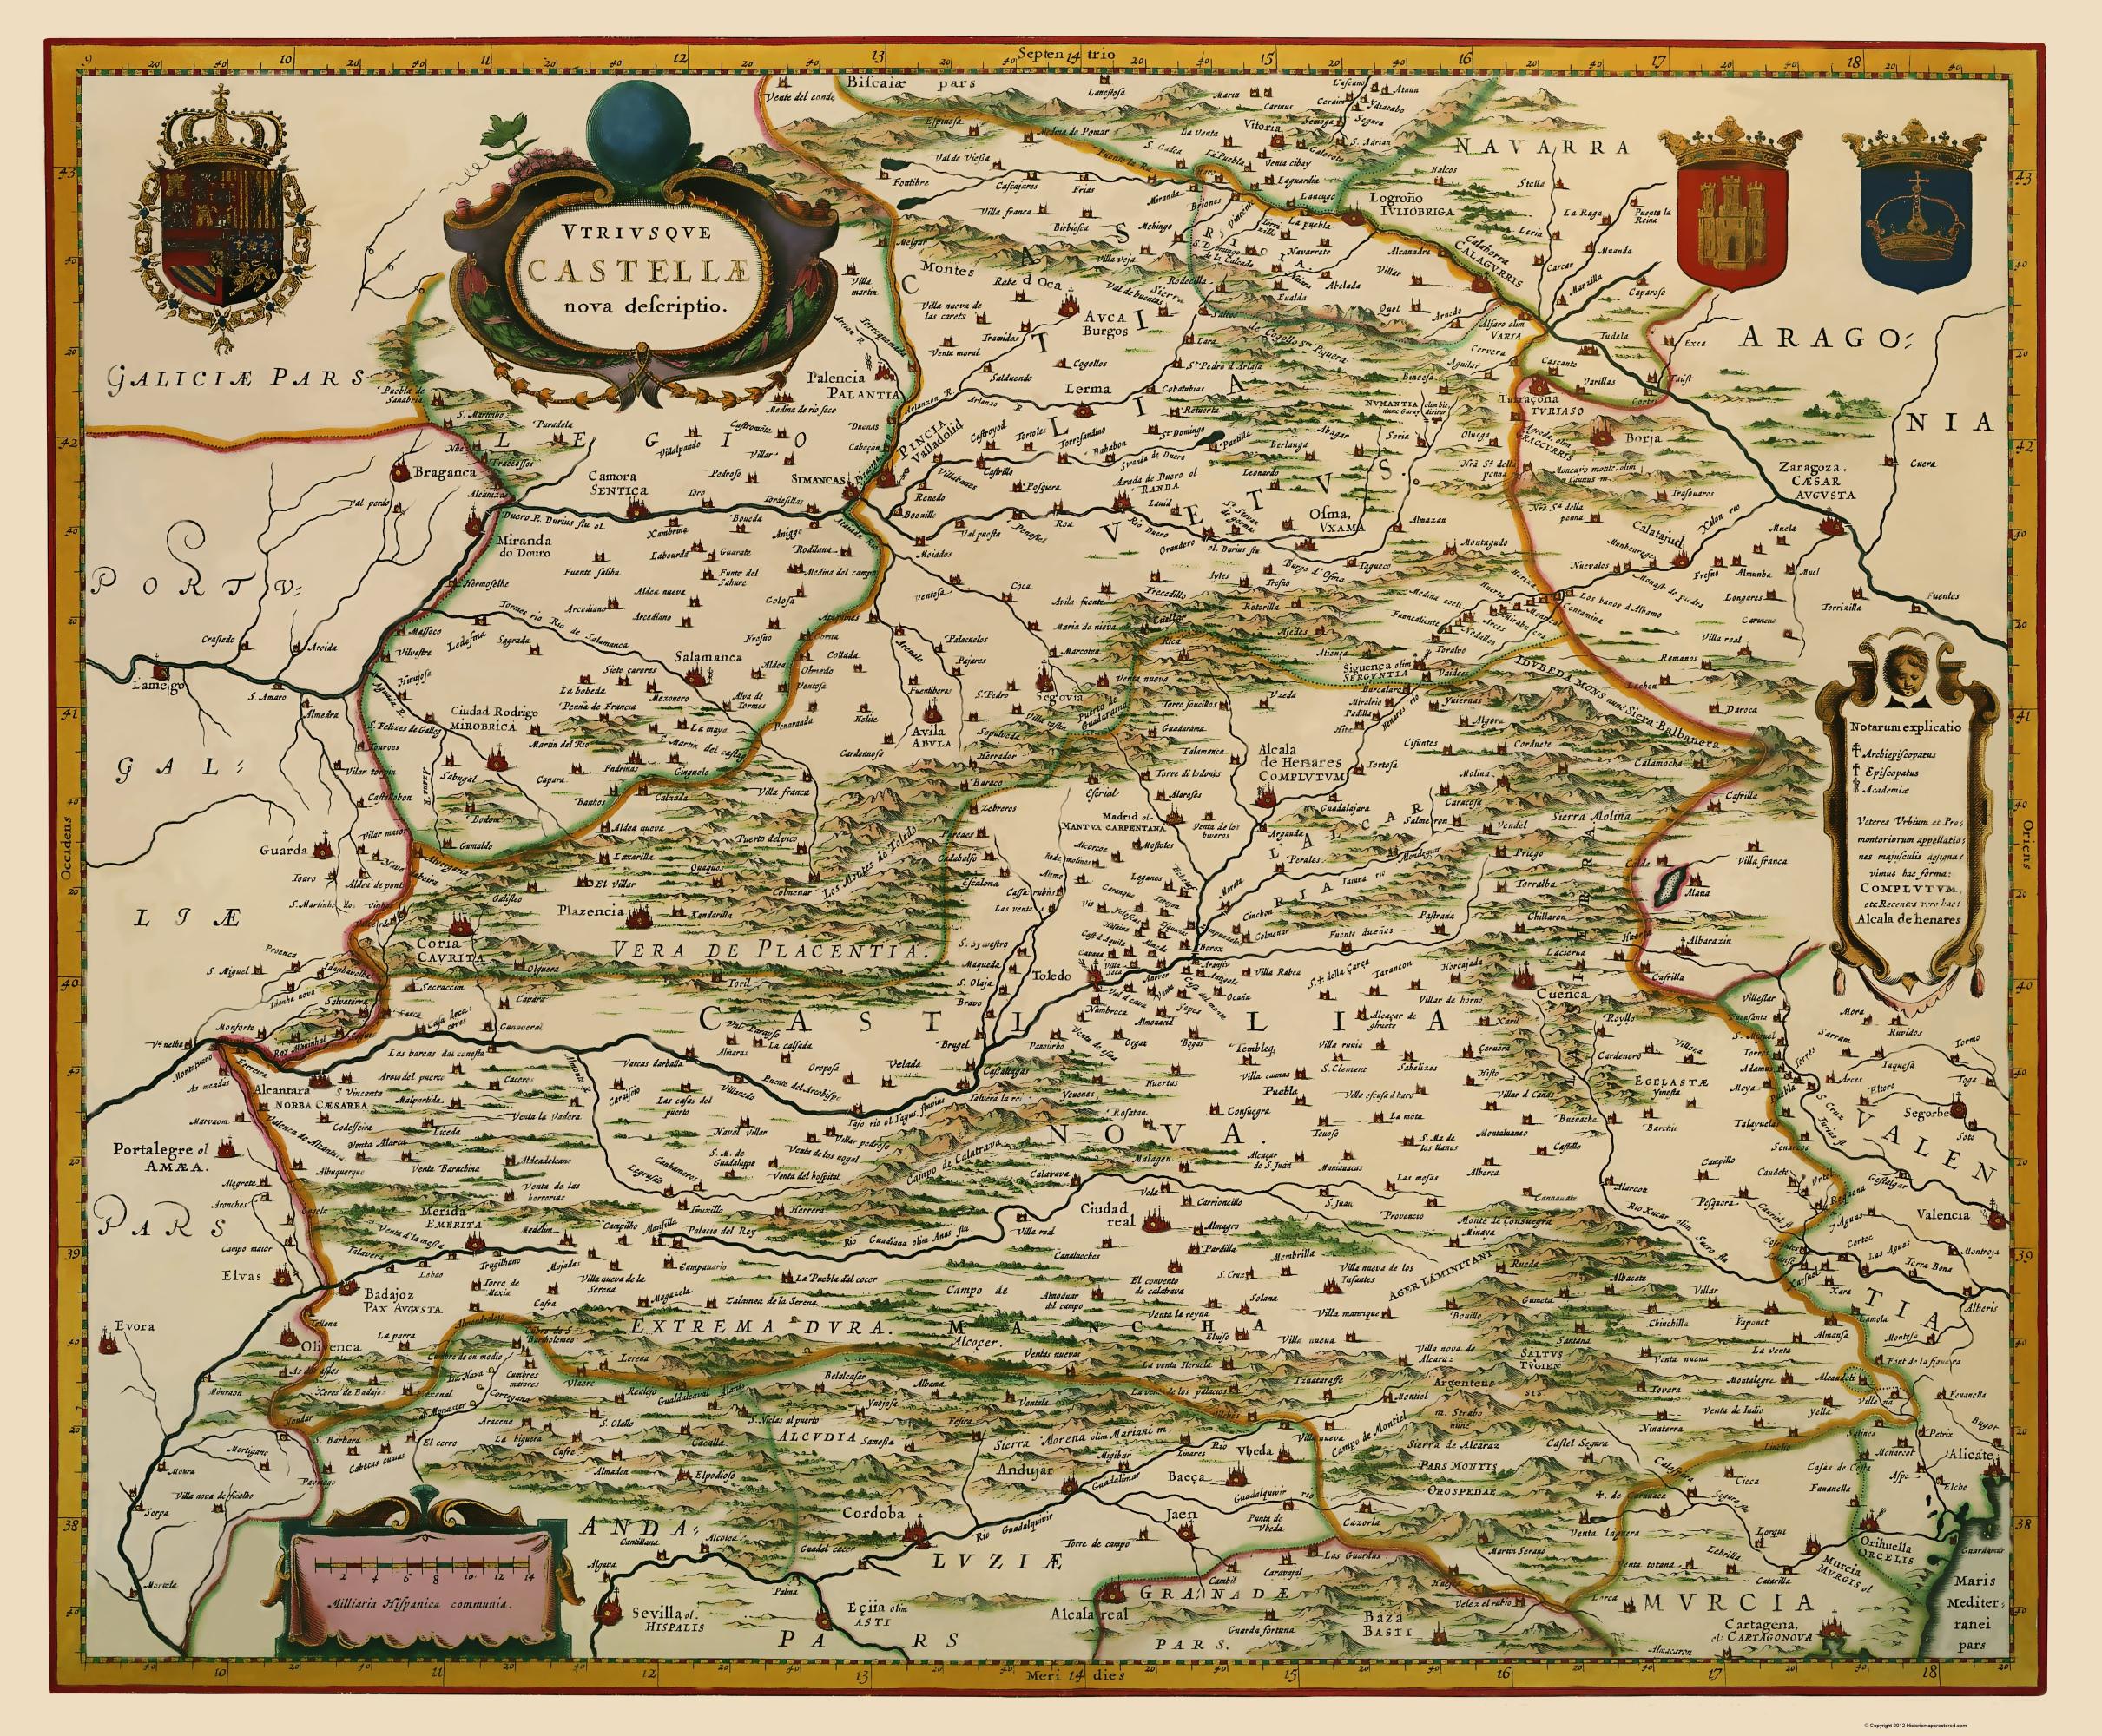 Old Iberian Peninsula Map - Castile, Spain Blaeu 1635 on